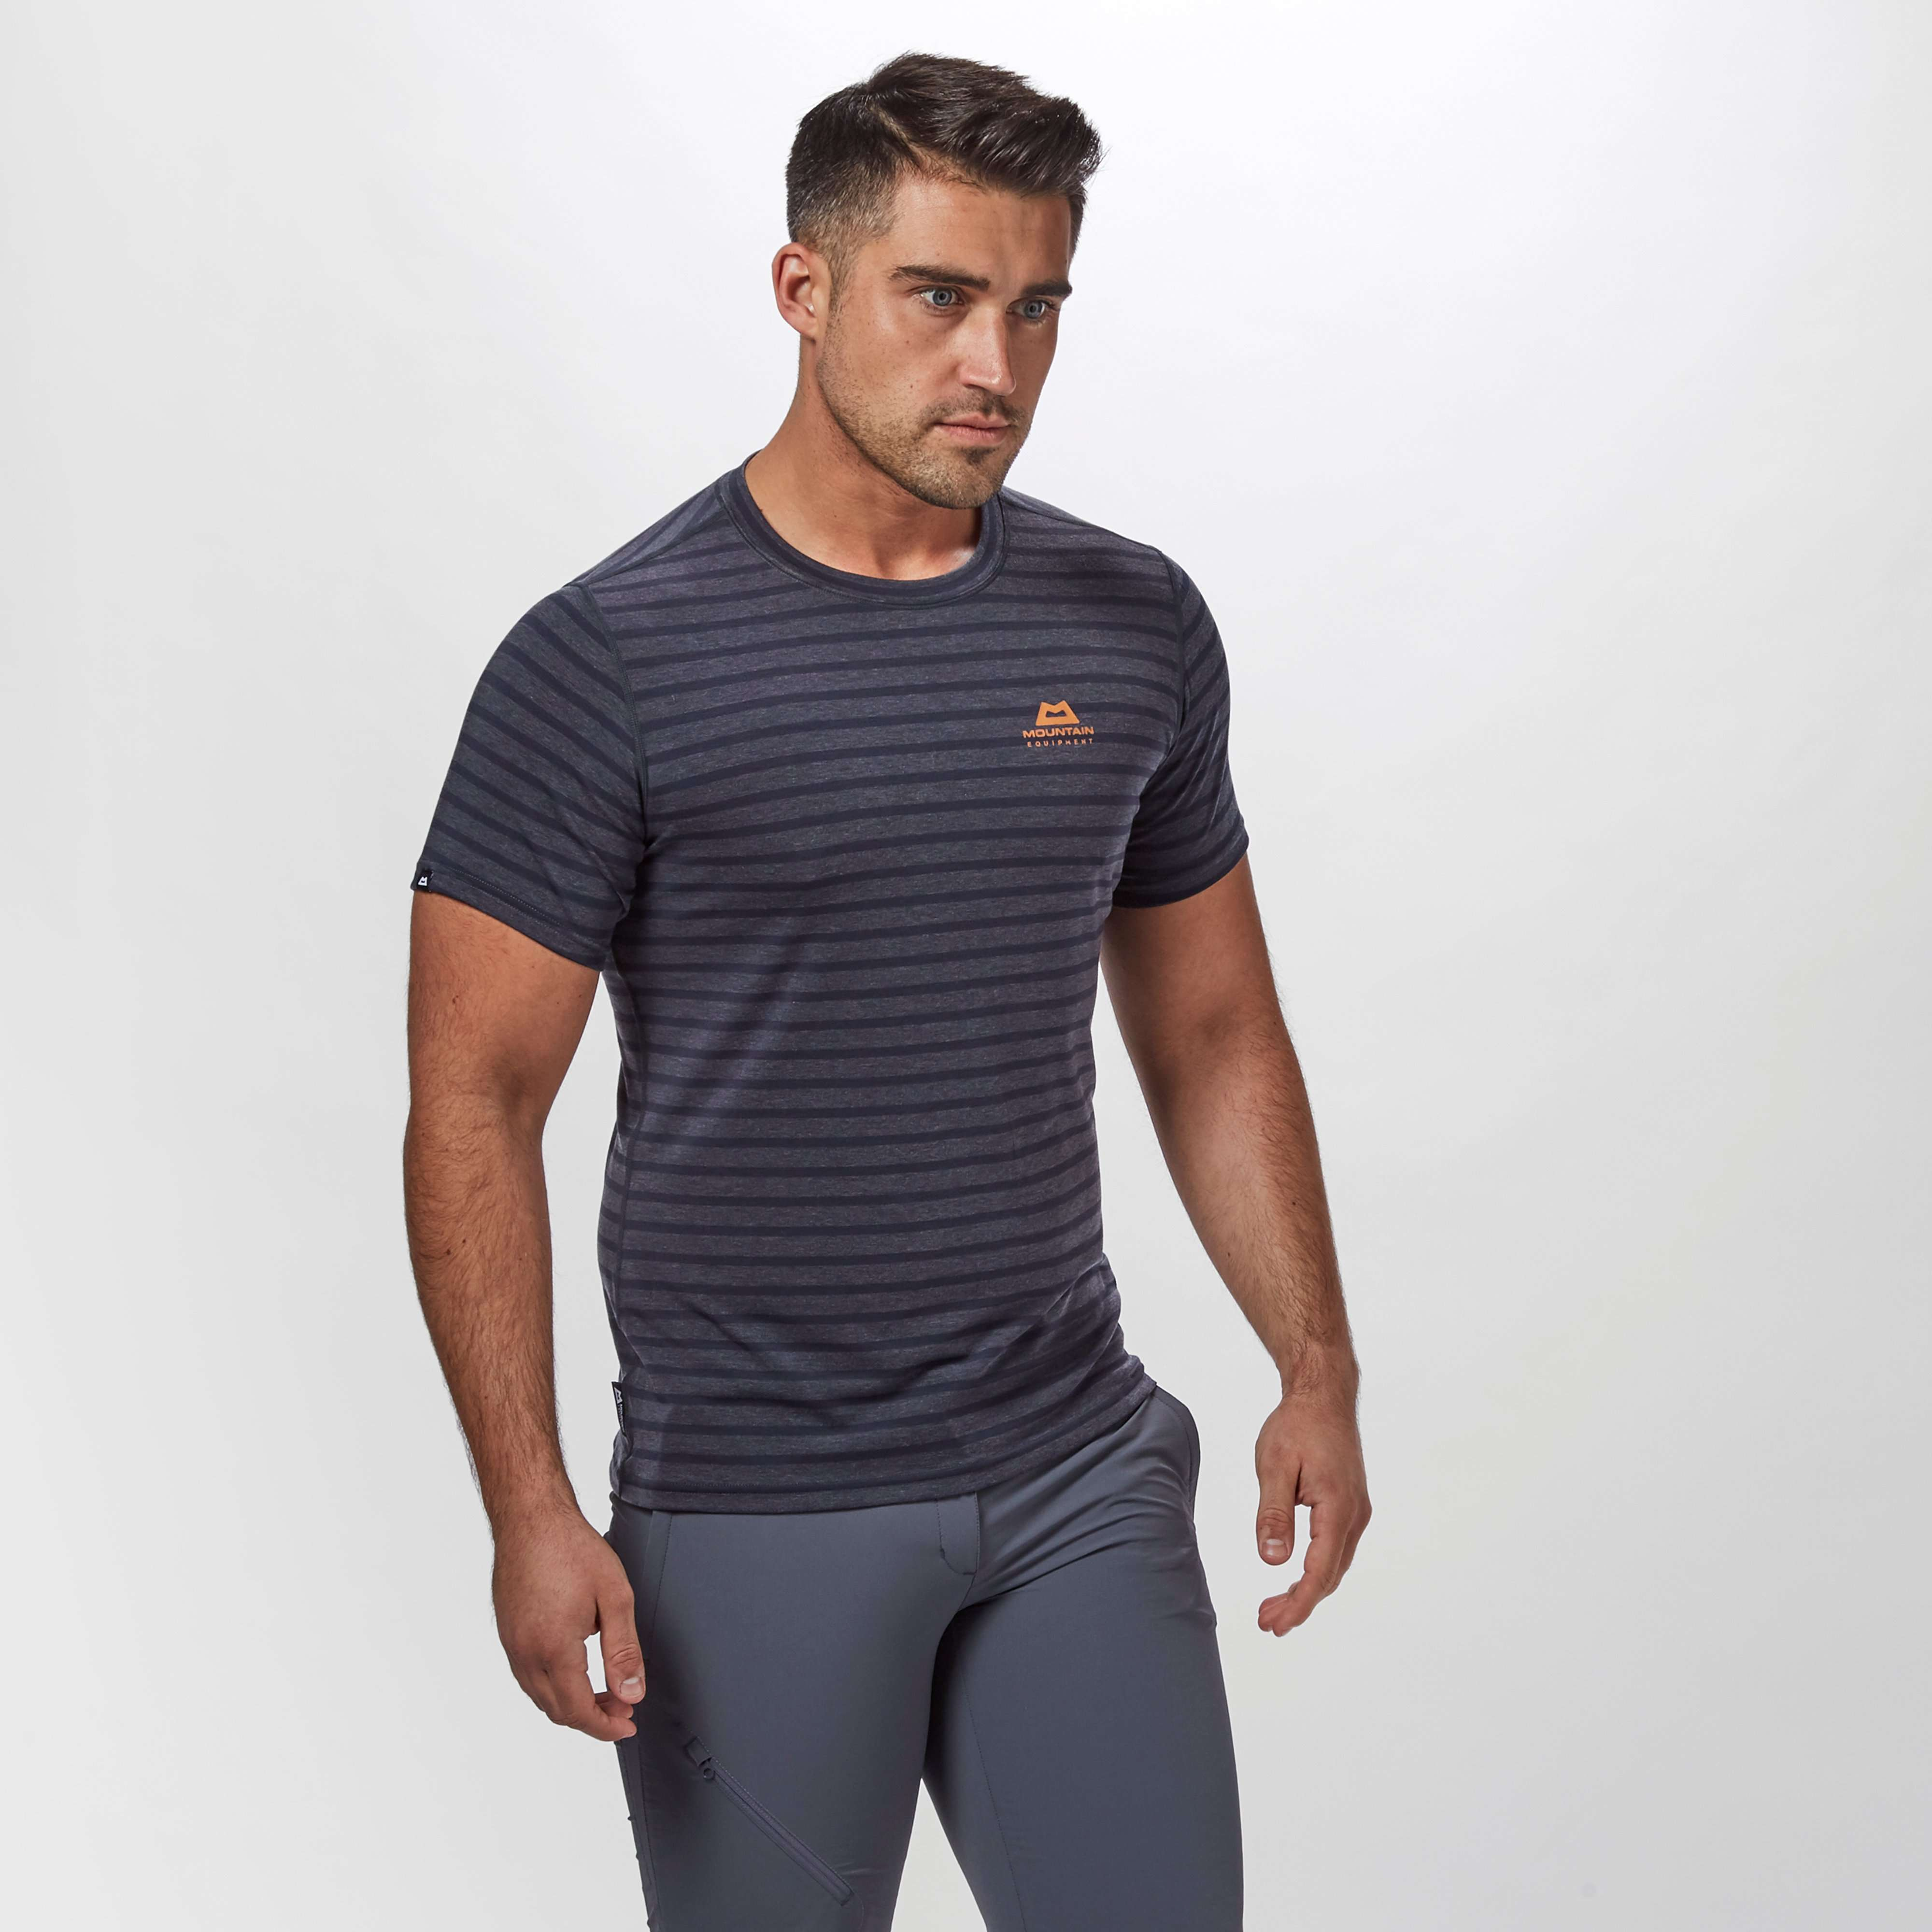 MOUNTAIN EQUIPMENT Men's Ground Up T-Shirt